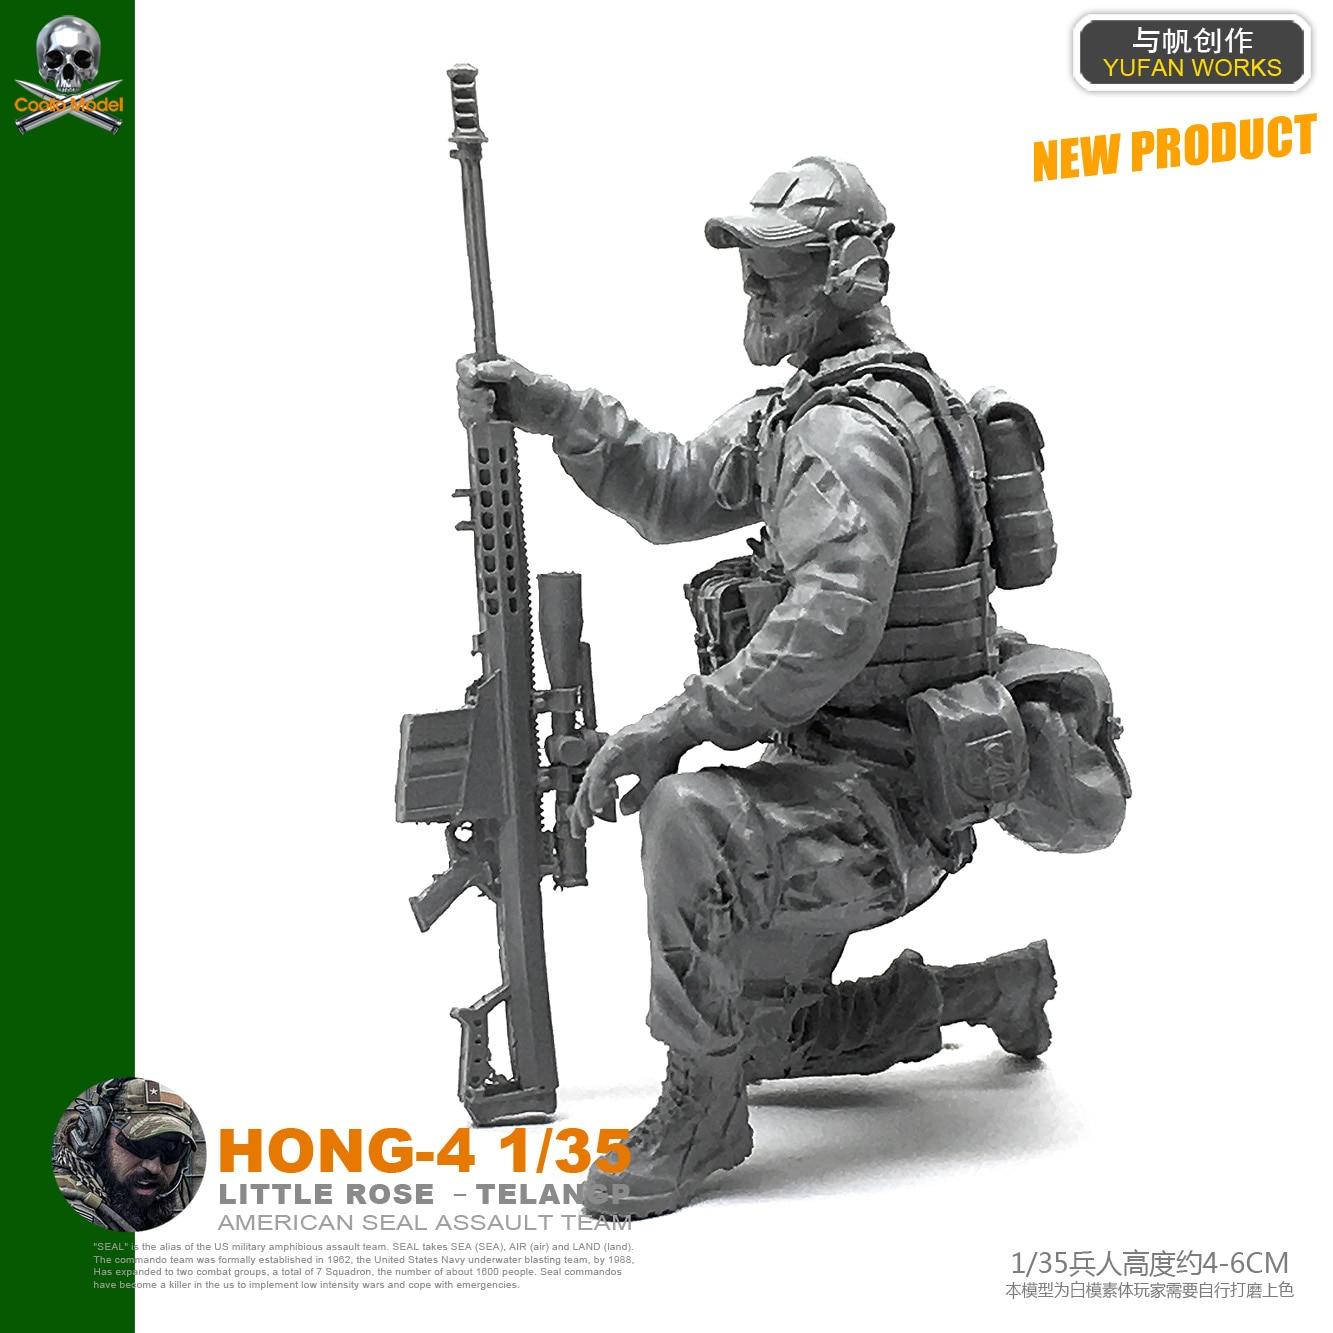 Yufan Model 1/35 Model Kits Us Seal Sniper Resin Soldier Figure Hong-04